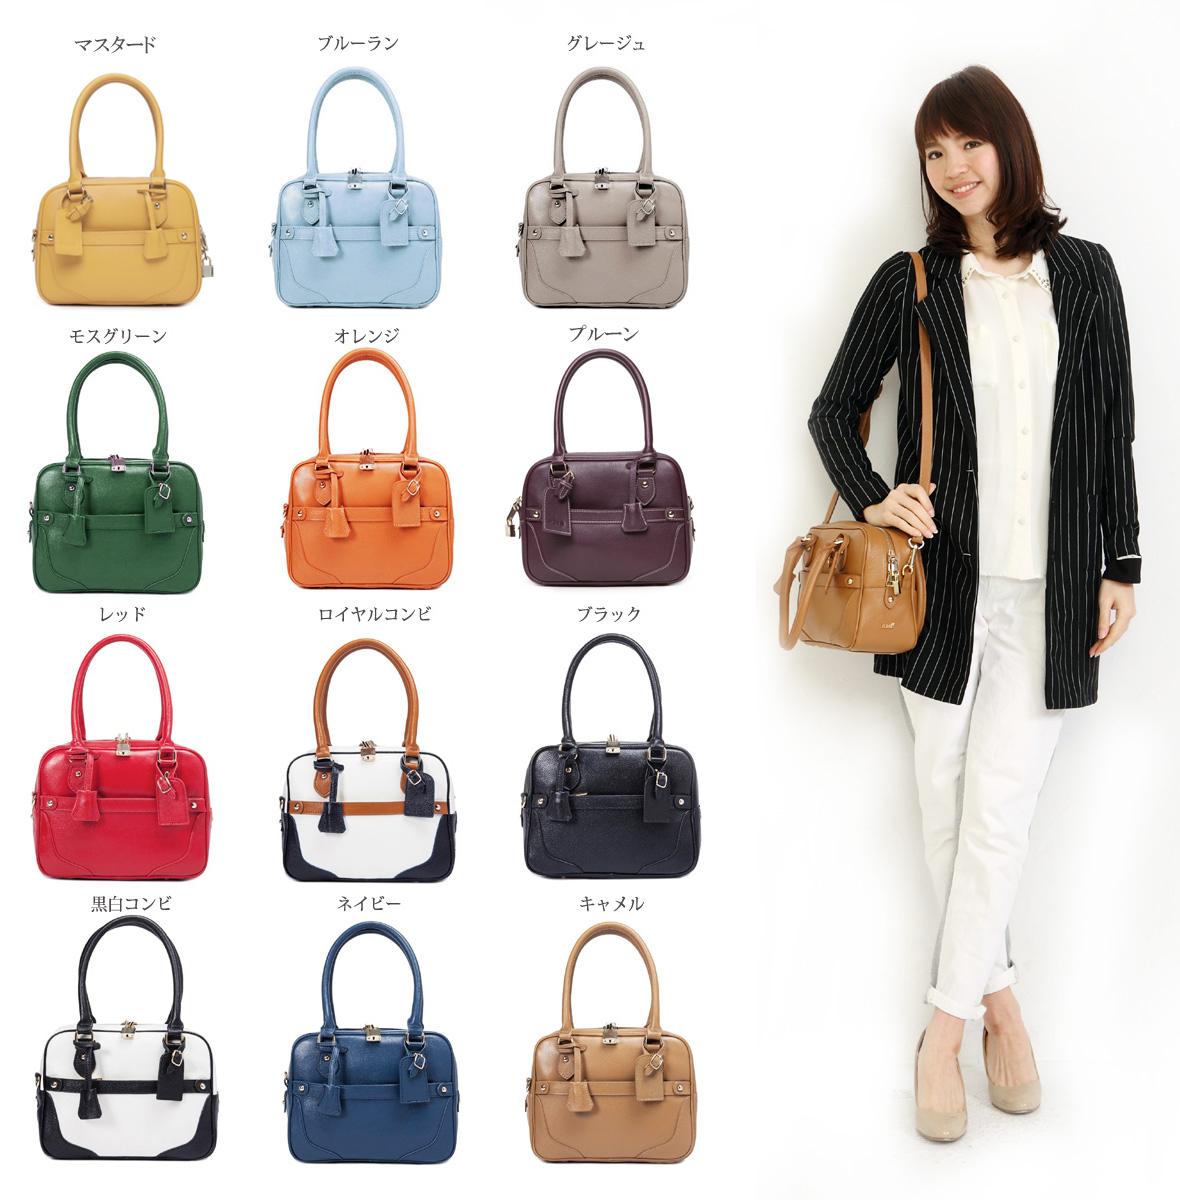 Try To Limit Price Wearing Their Brand Iuha New Stock Leather Mini Mia